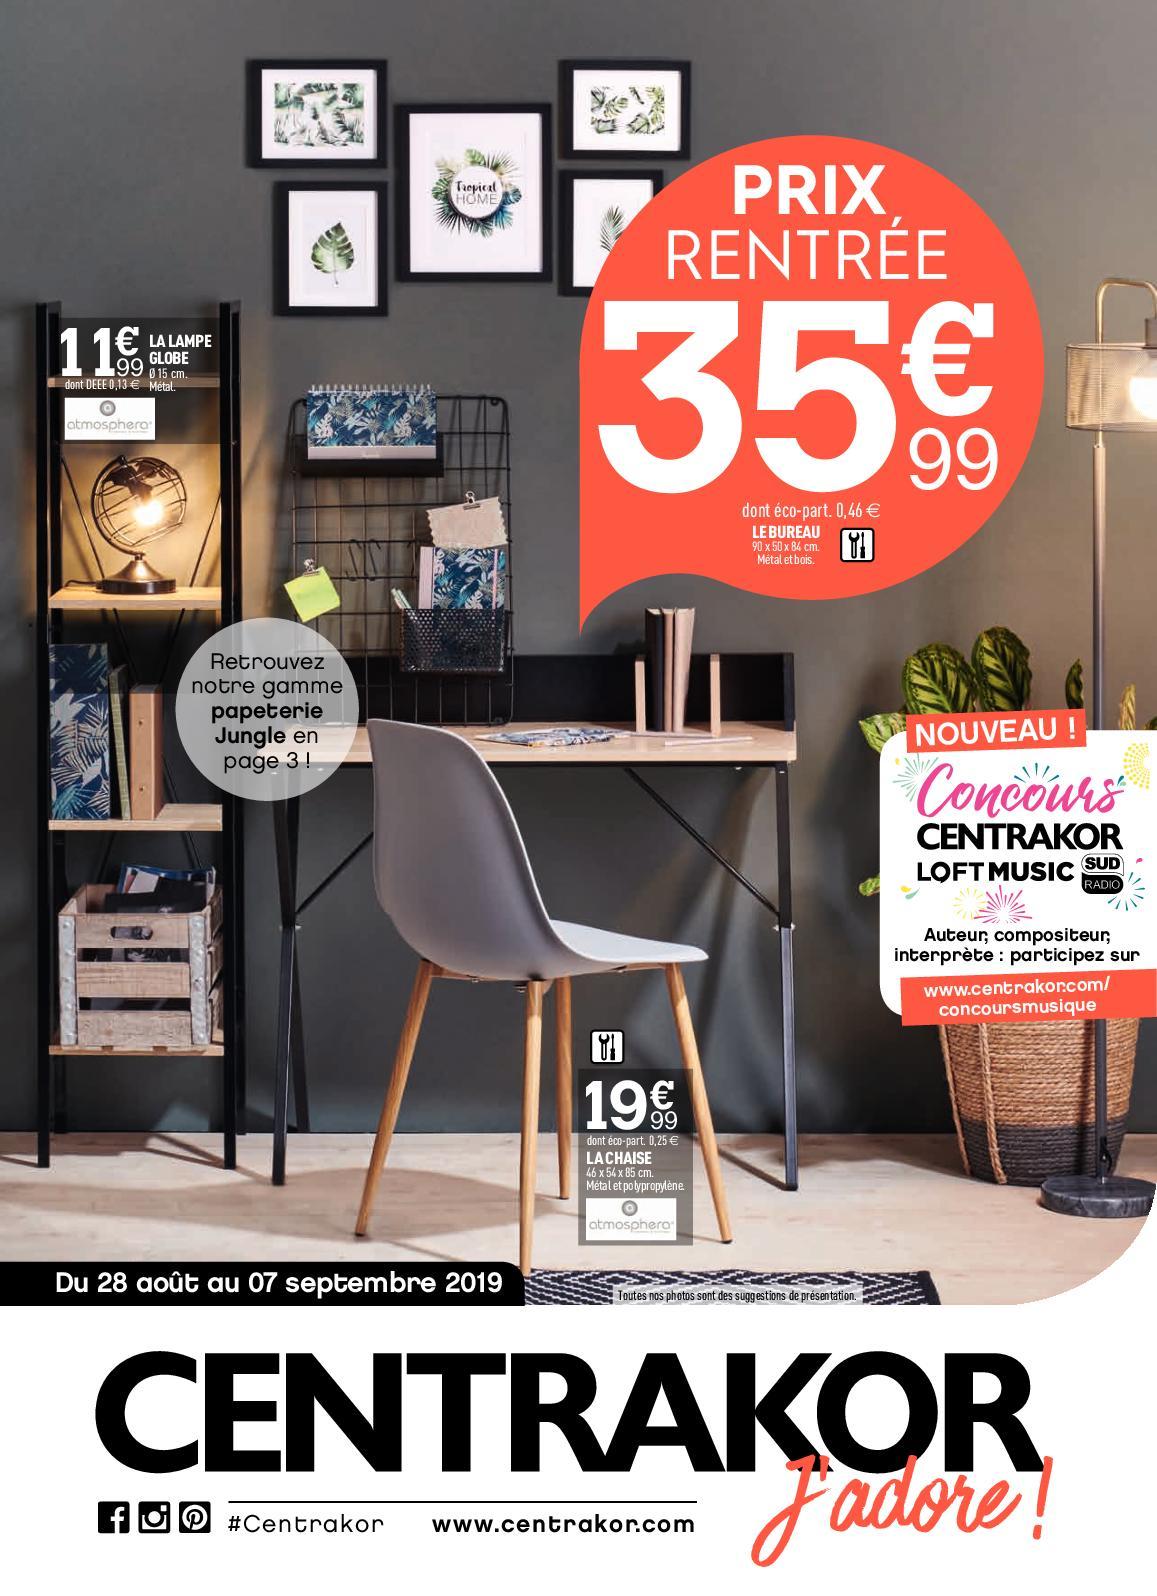 Calaméo Catalogue 633 Centrakor Prix Rentrée édition